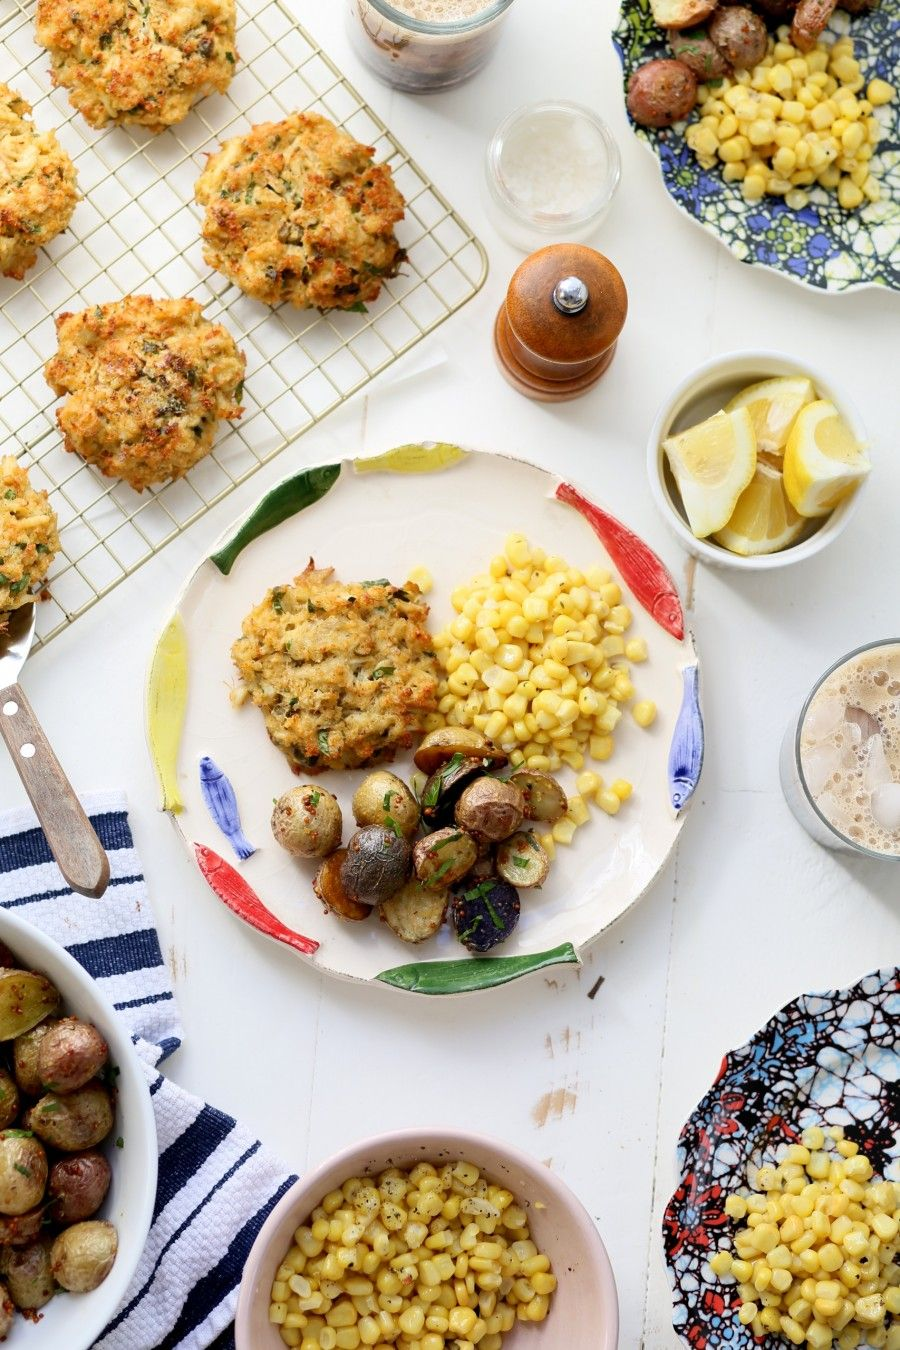 Crab cake dinner joy the baker recipe crab cakes